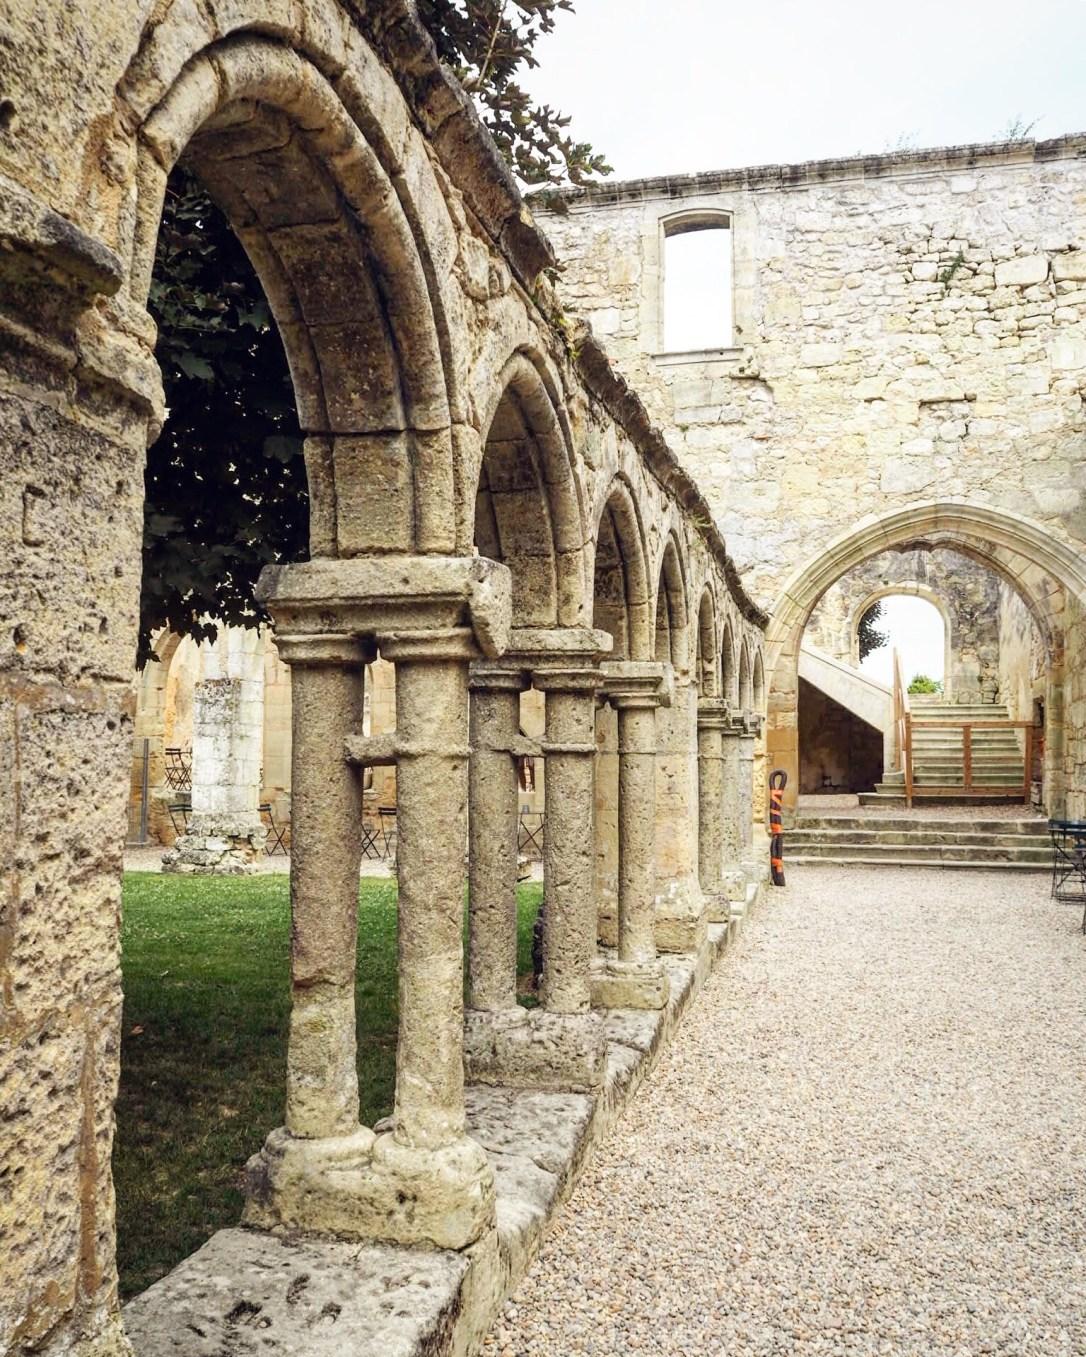 Arches of the Cordeliers Cloister, France - Bordeaux to St Émilion by train